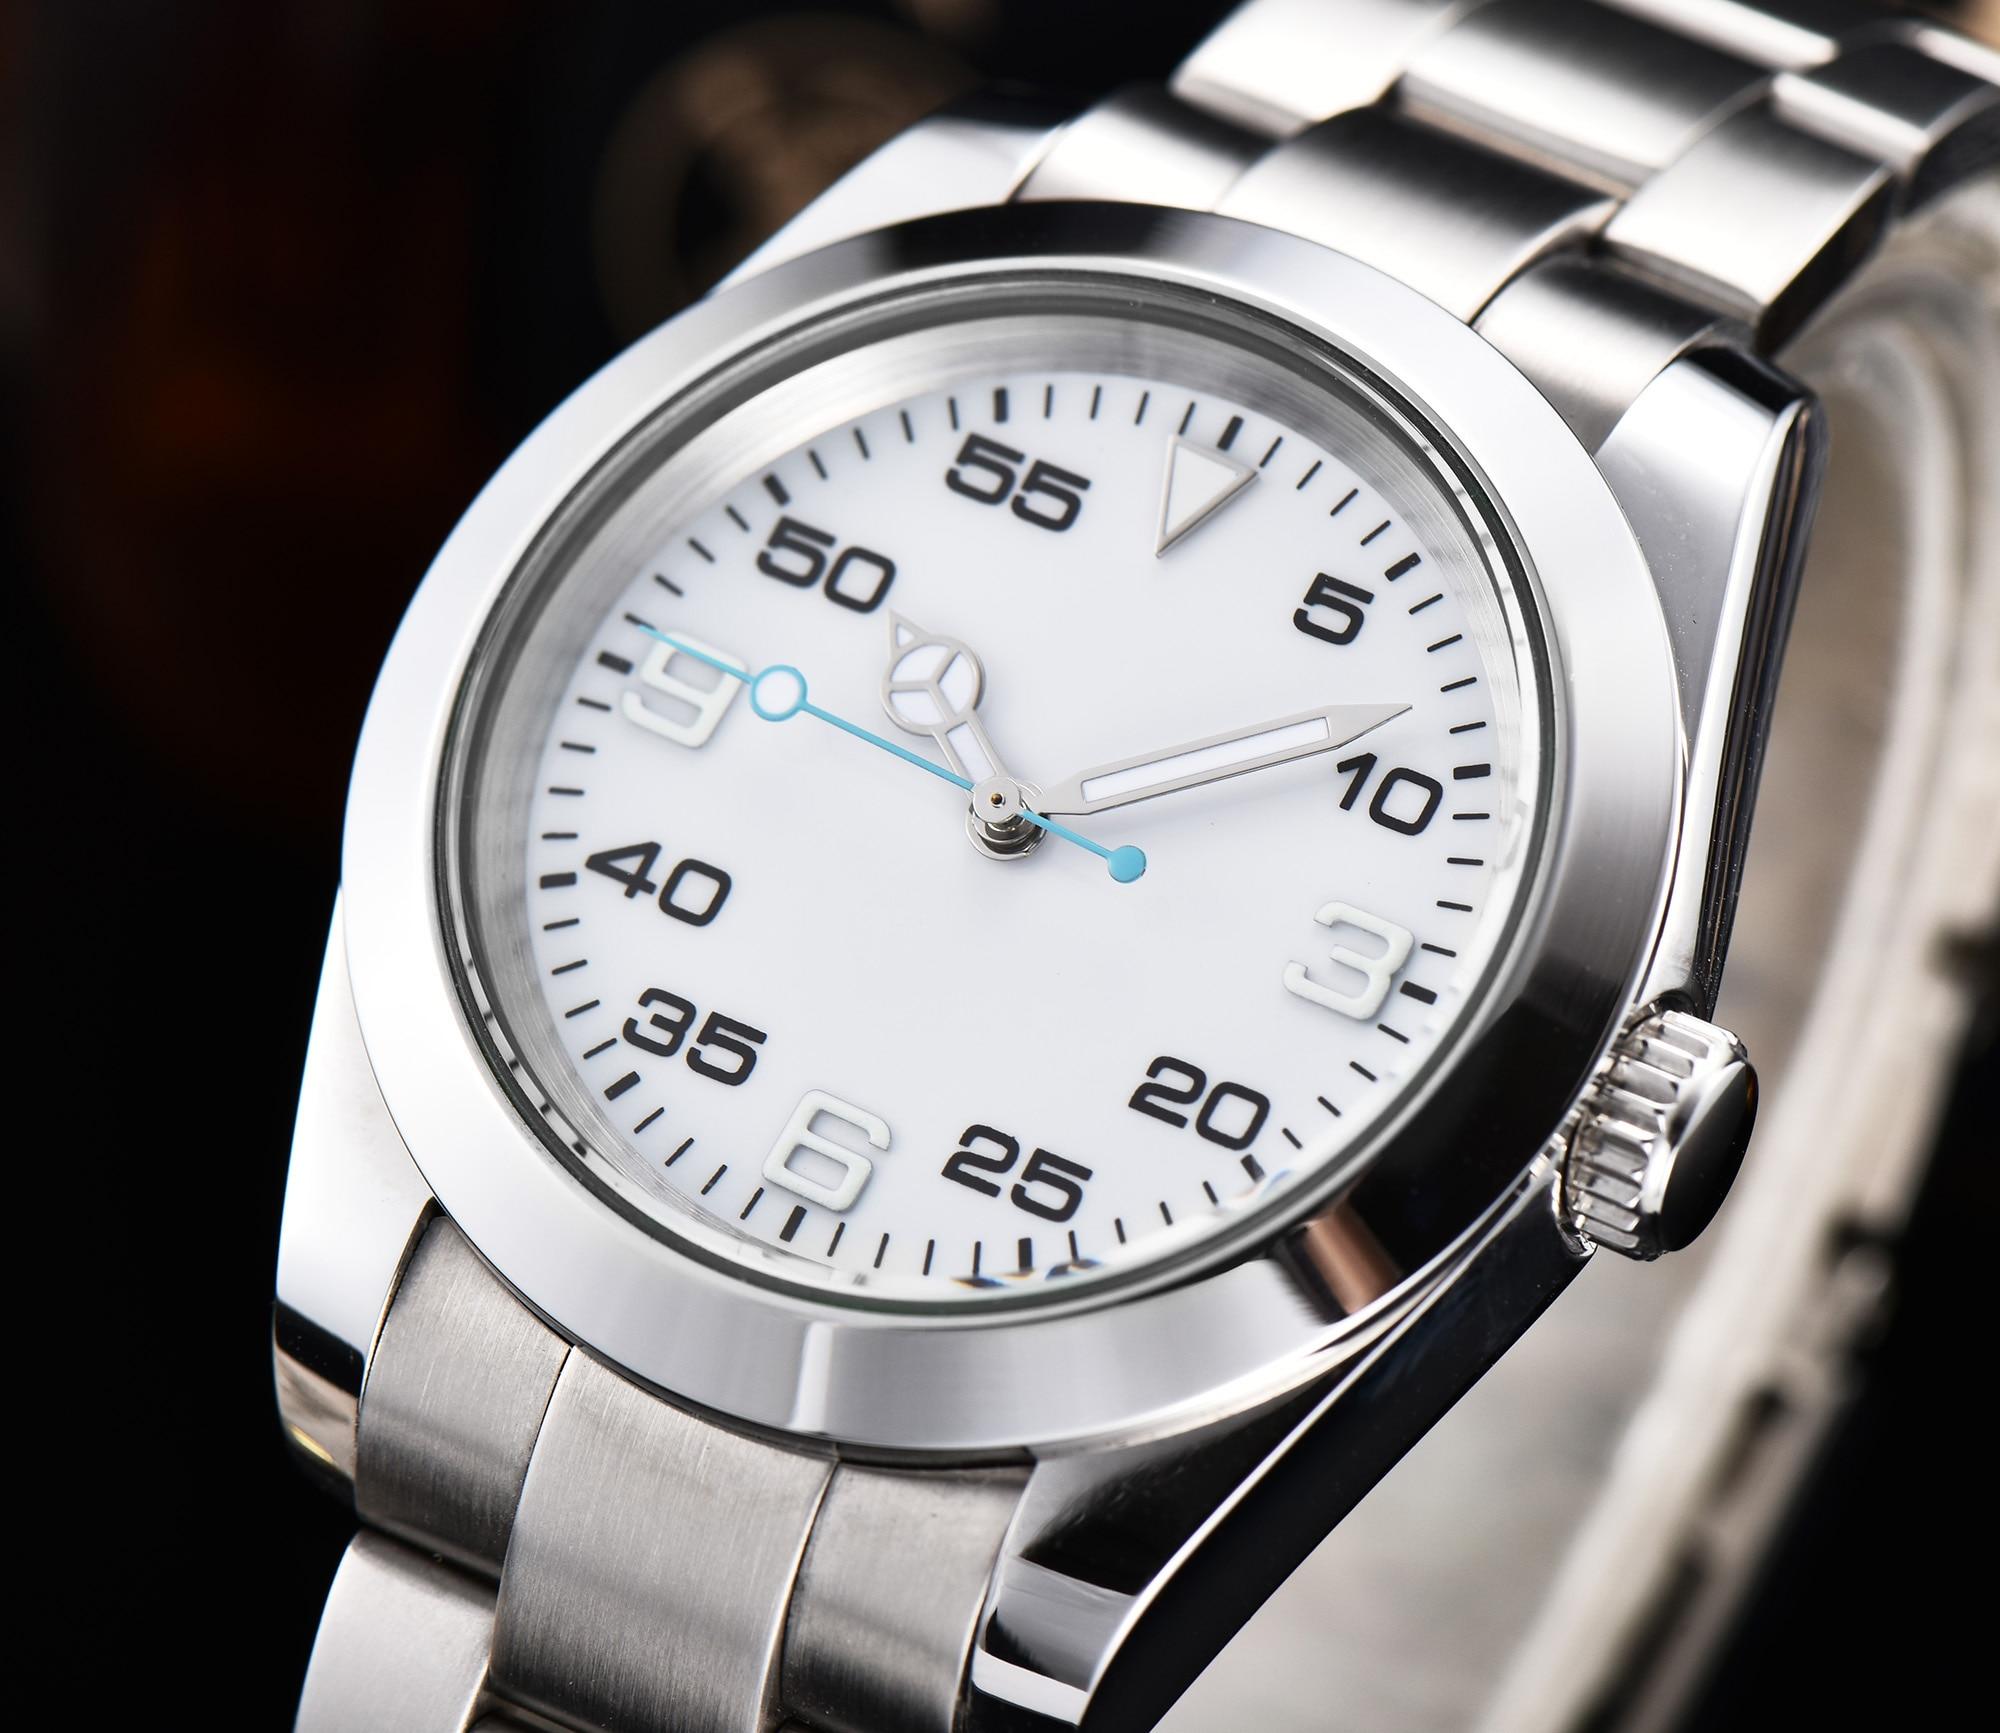 automatic mechanical watch watch men Luminous waterproof 316L Solid stainless steel 40MM LLS899